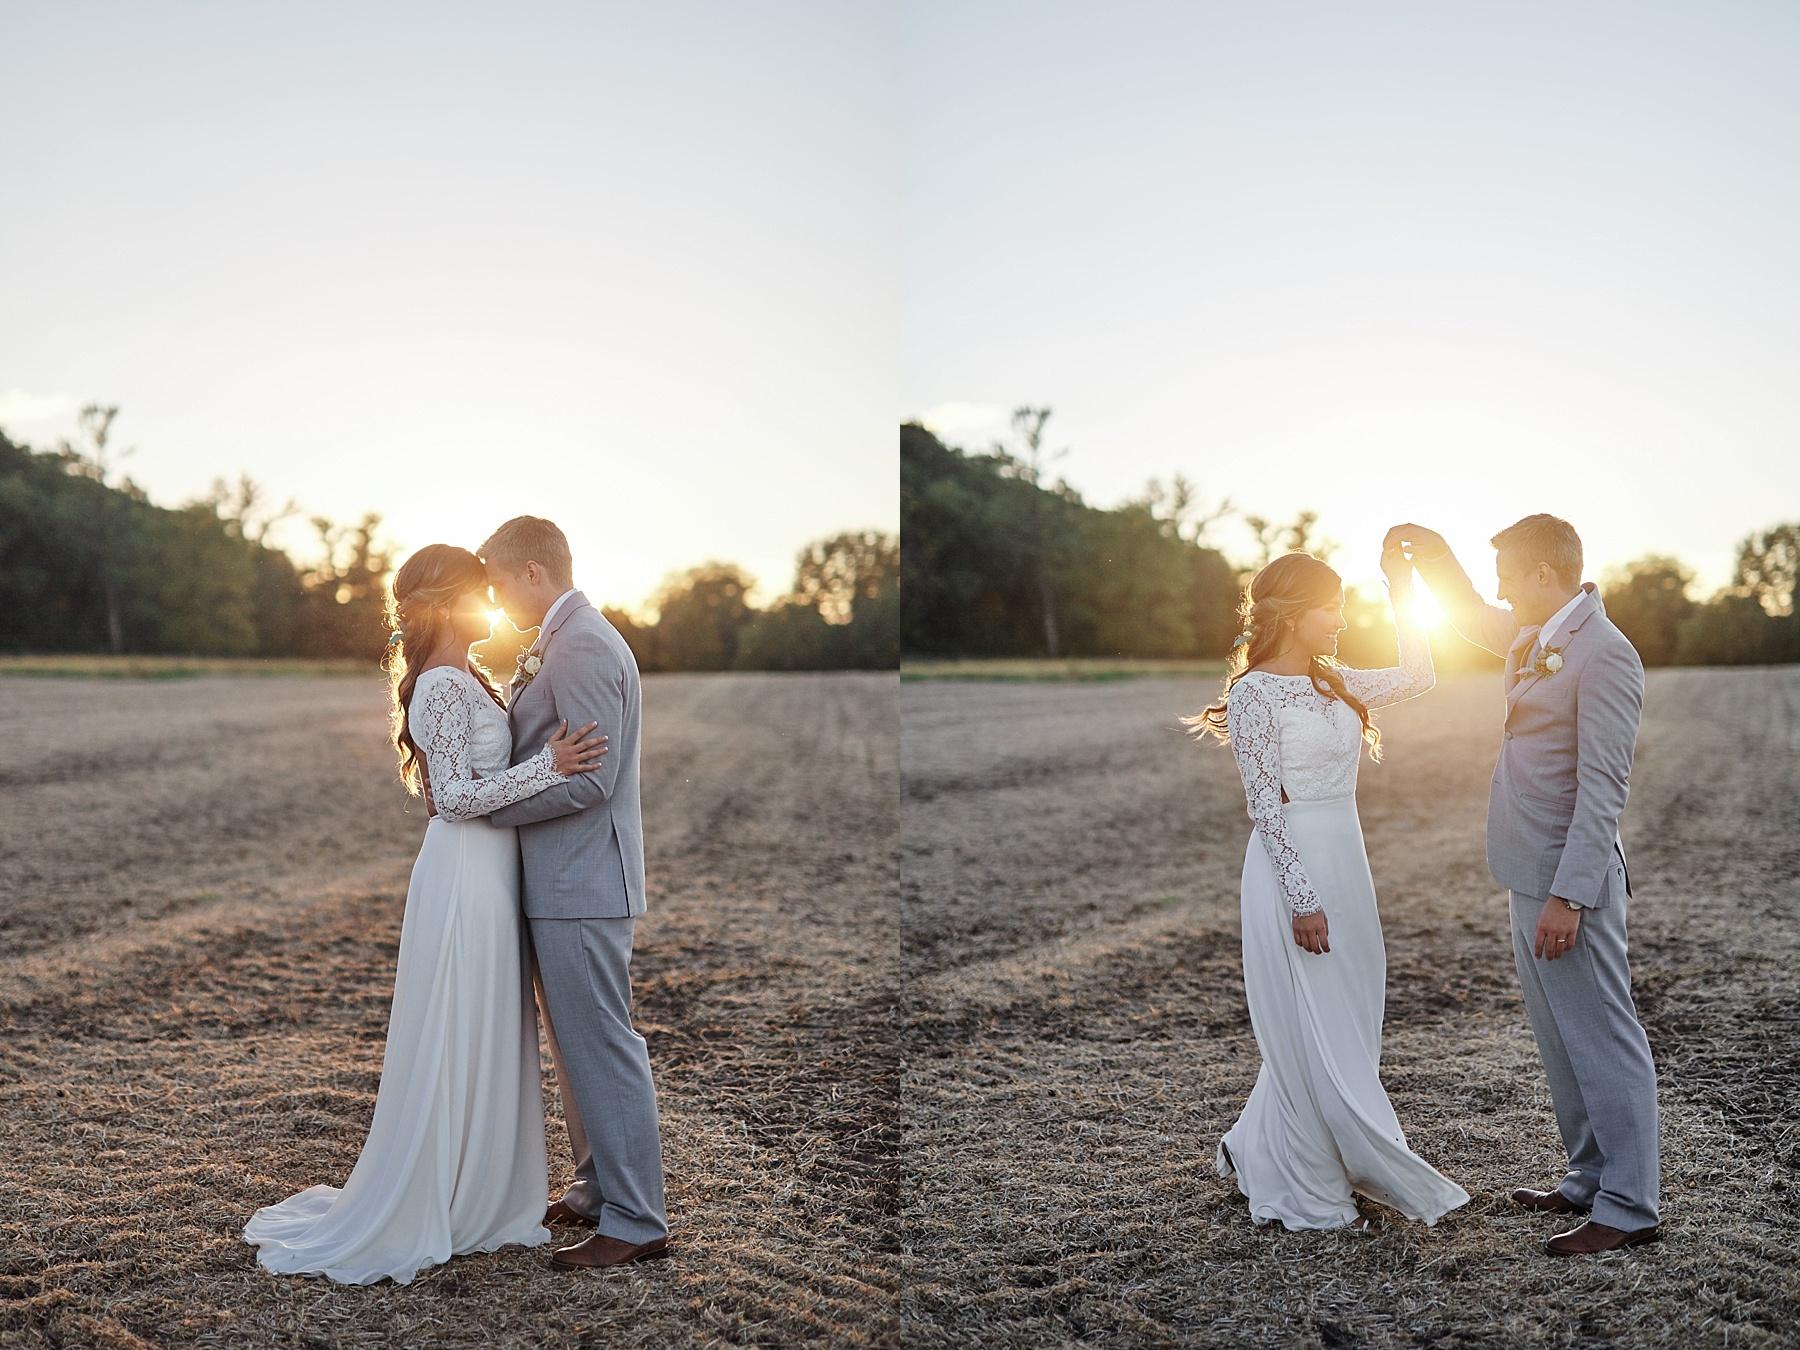 Maywood-Stone-Barn-Wedding-Rochester-Minnesota-Perry-James-Photo_0670.jpg